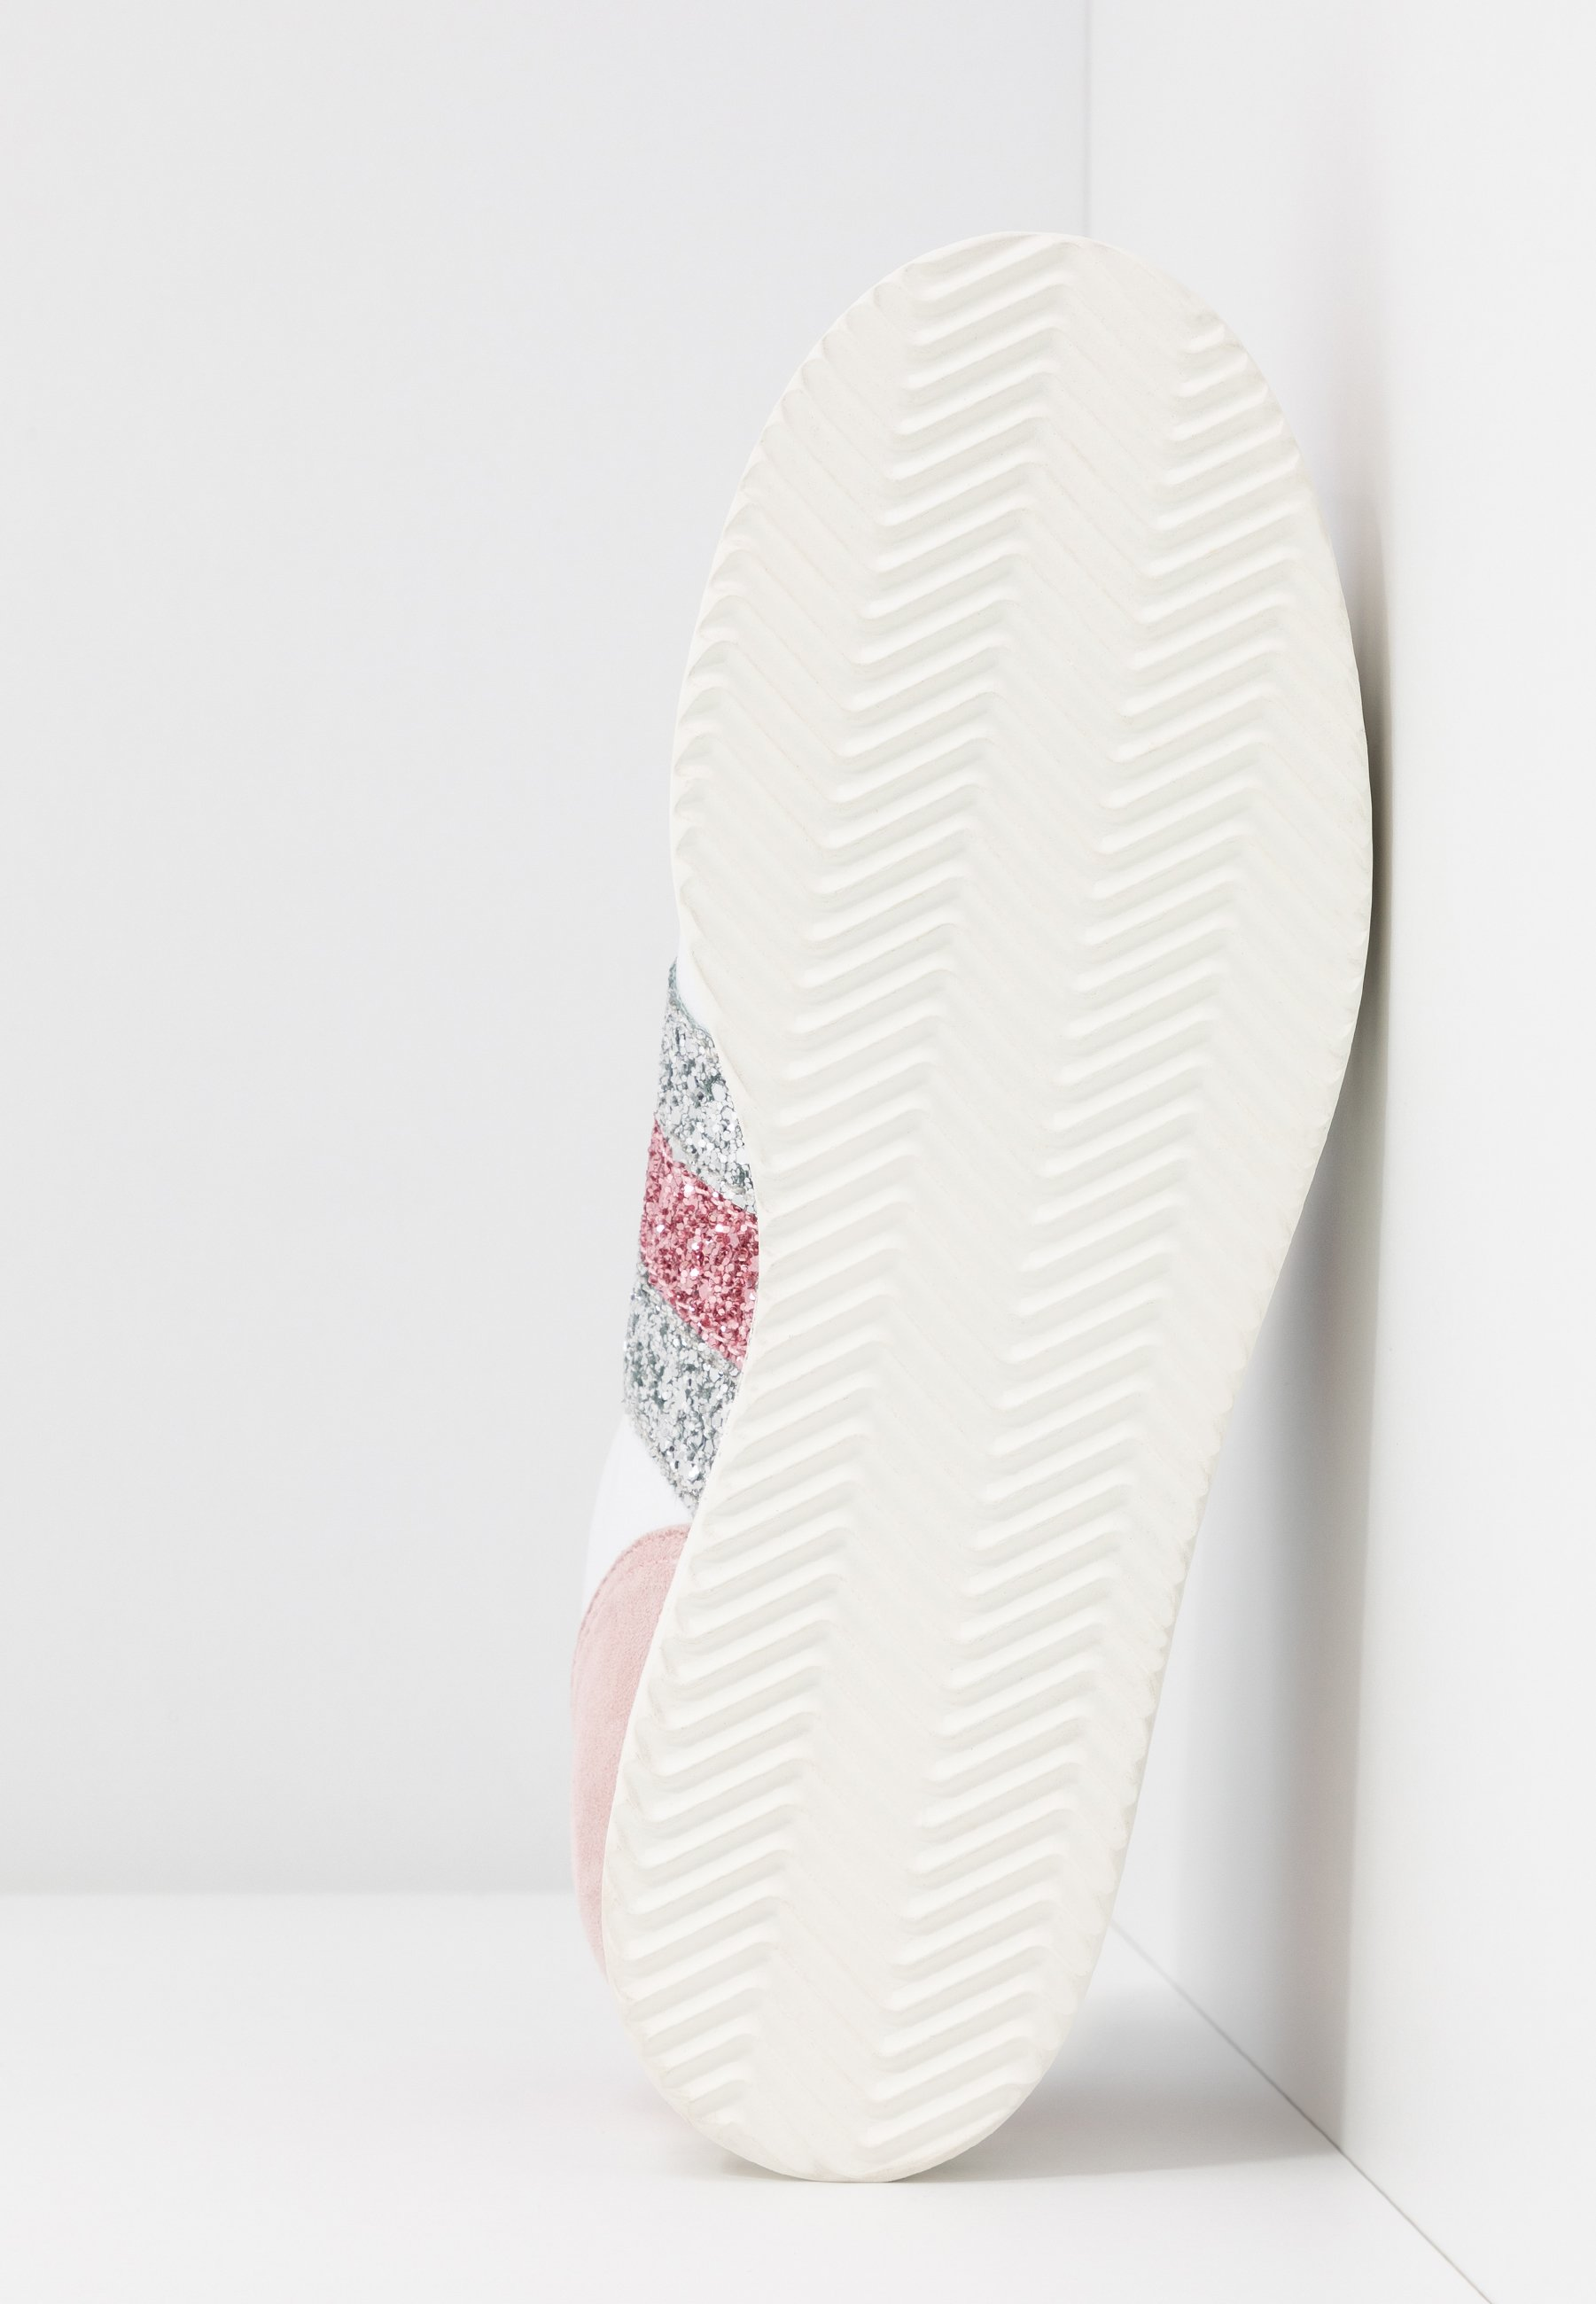 CHIARA FERRAGNI PLAT FORM - Sneakers - pink